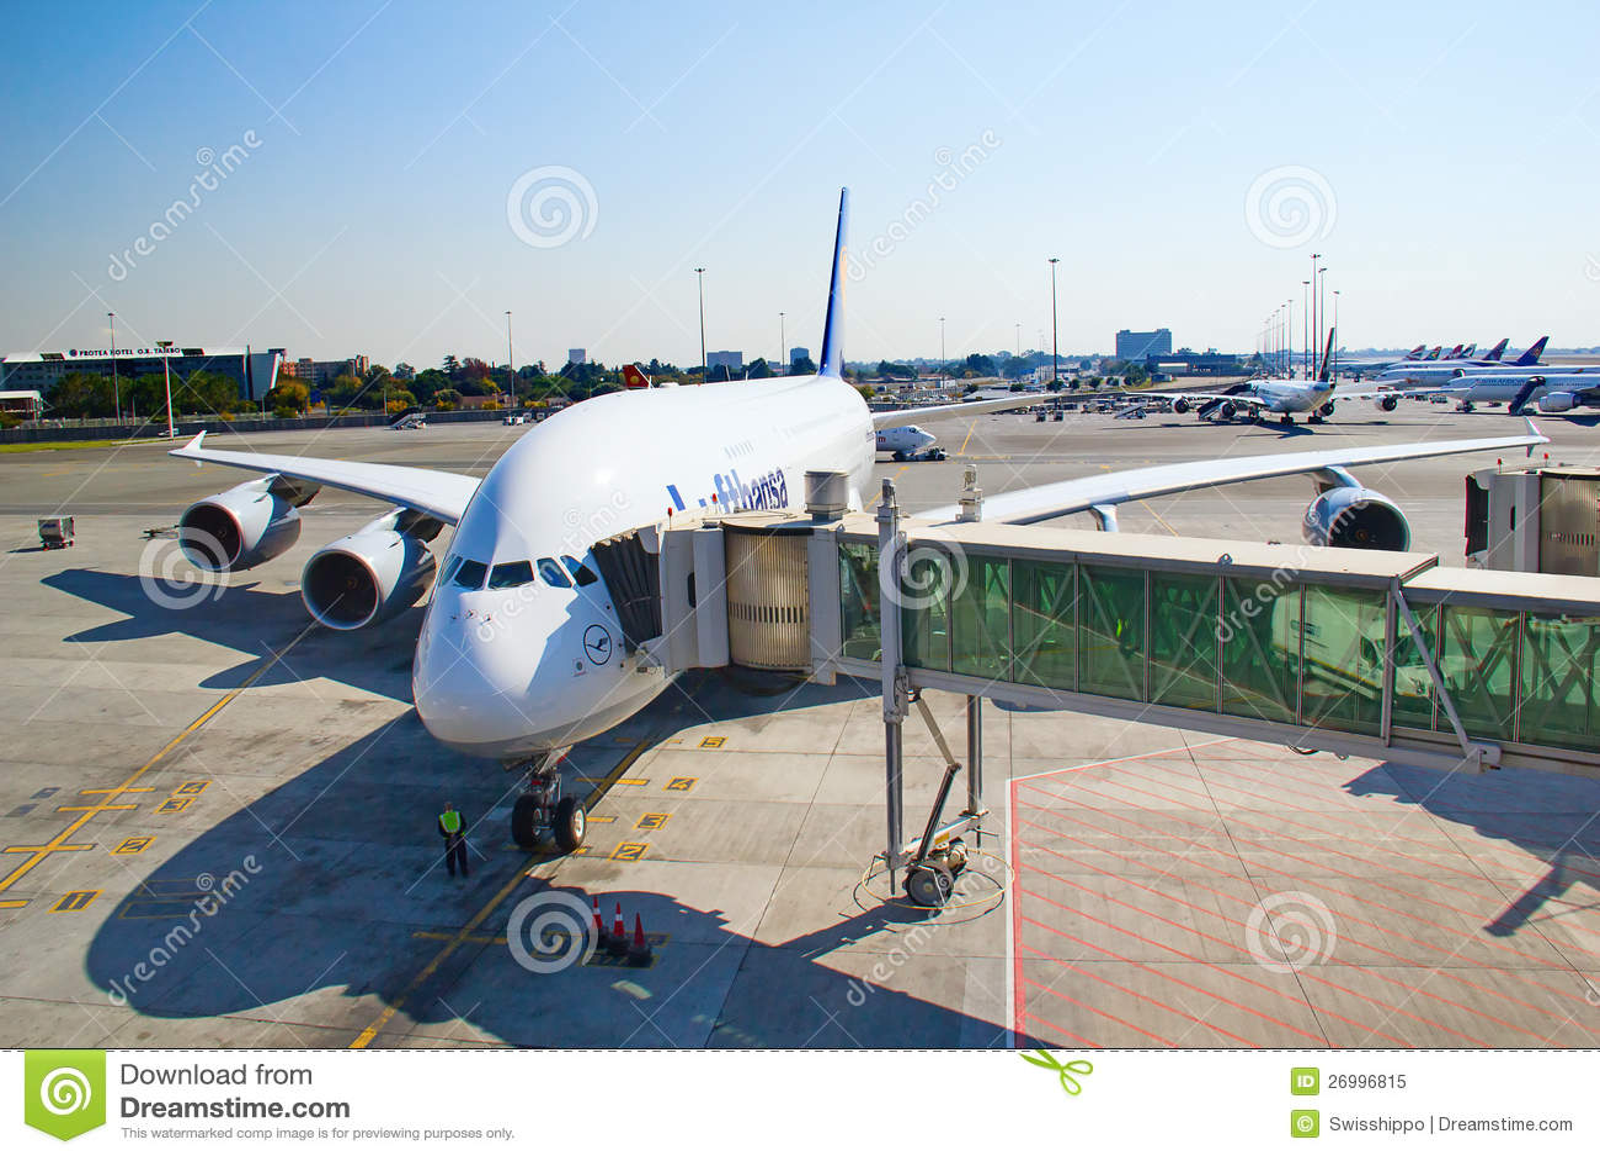 Aeroporto Johannesburg : Johannesburg tambo airport editorial image of